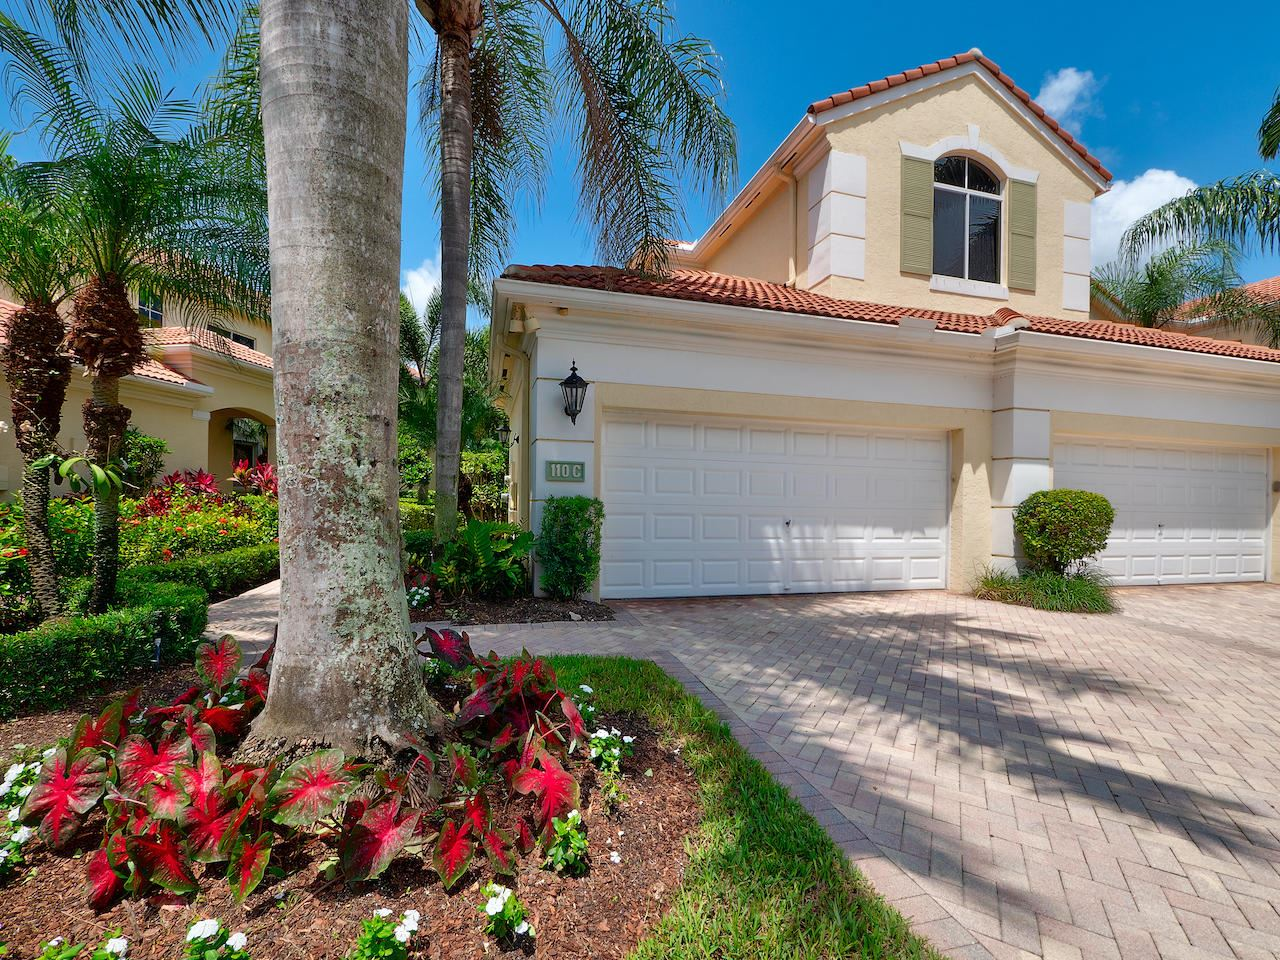 Photo of 110 Palm Bay Lane #C, Palm Beach Gardens, FL 33418 (MLS # RX-10603542)